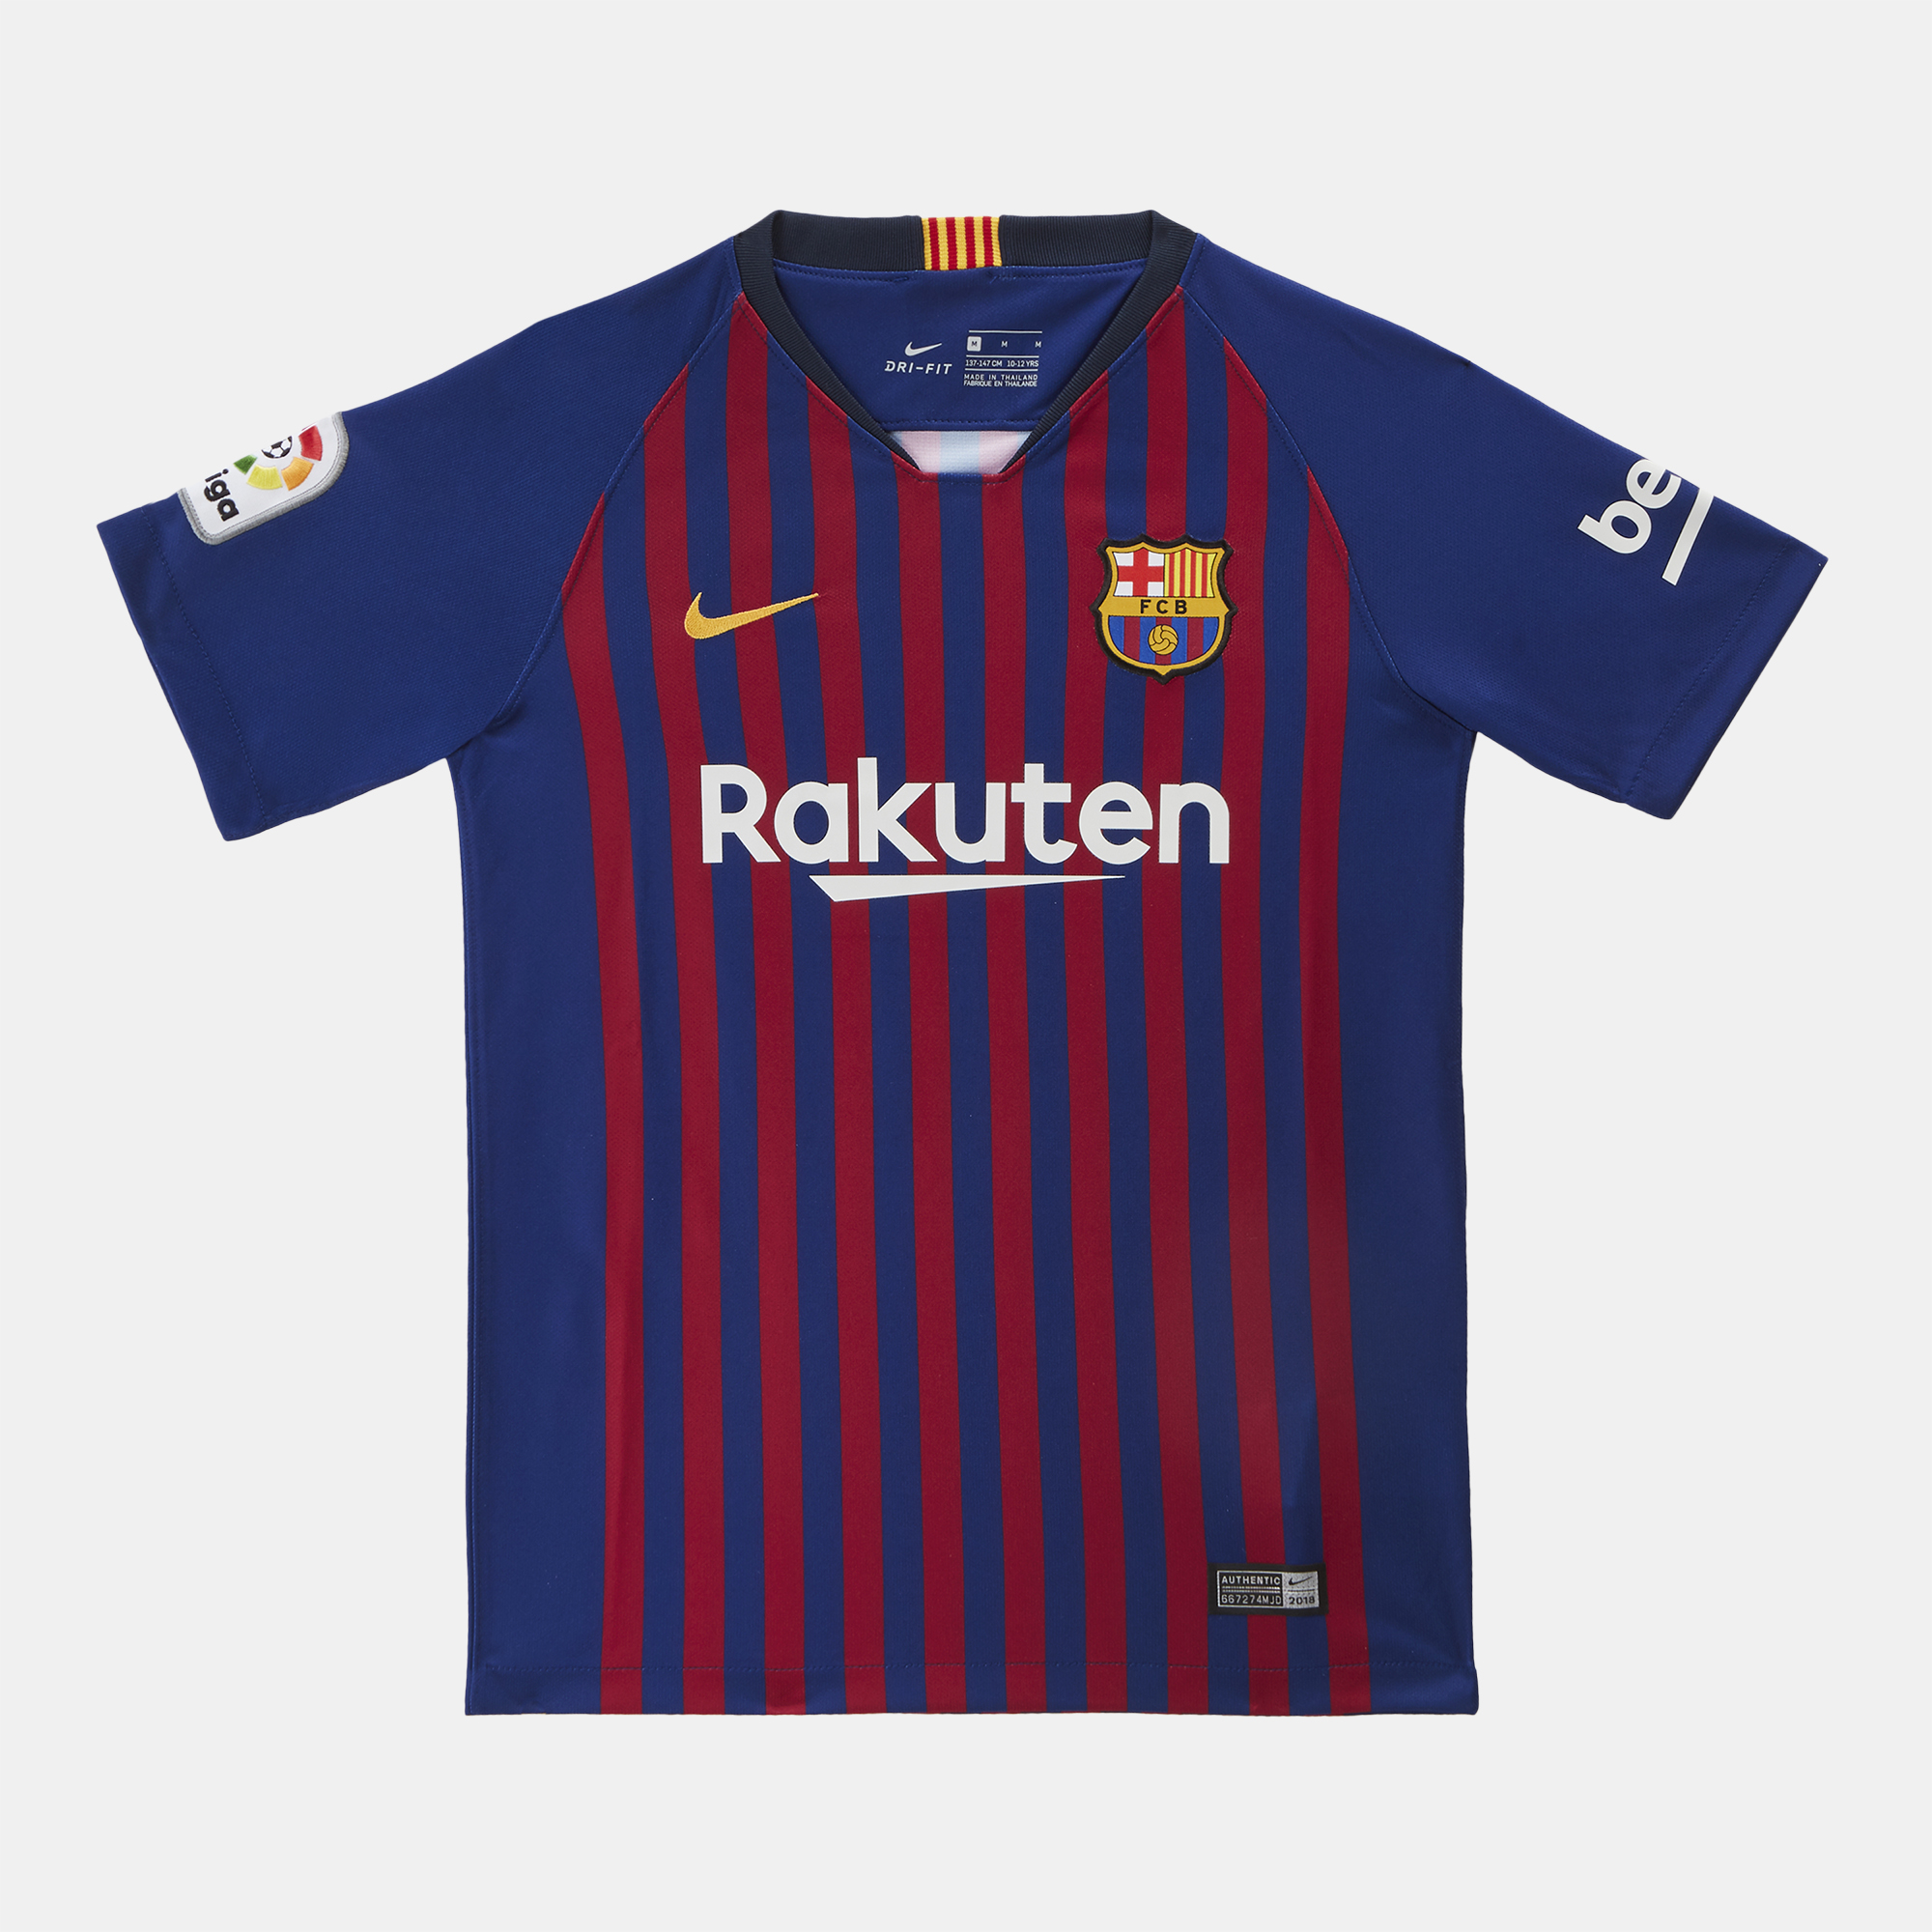 d3931077c قميص برشلونة الأساسي ستاديوم 2018/2019 من نايك للاطفال | قمصان الاندية  للاطفال | قمصان وتيشرتات للاطفال | تخفيضات الملابس للاطفال | تخفيضات  للاطفال ...